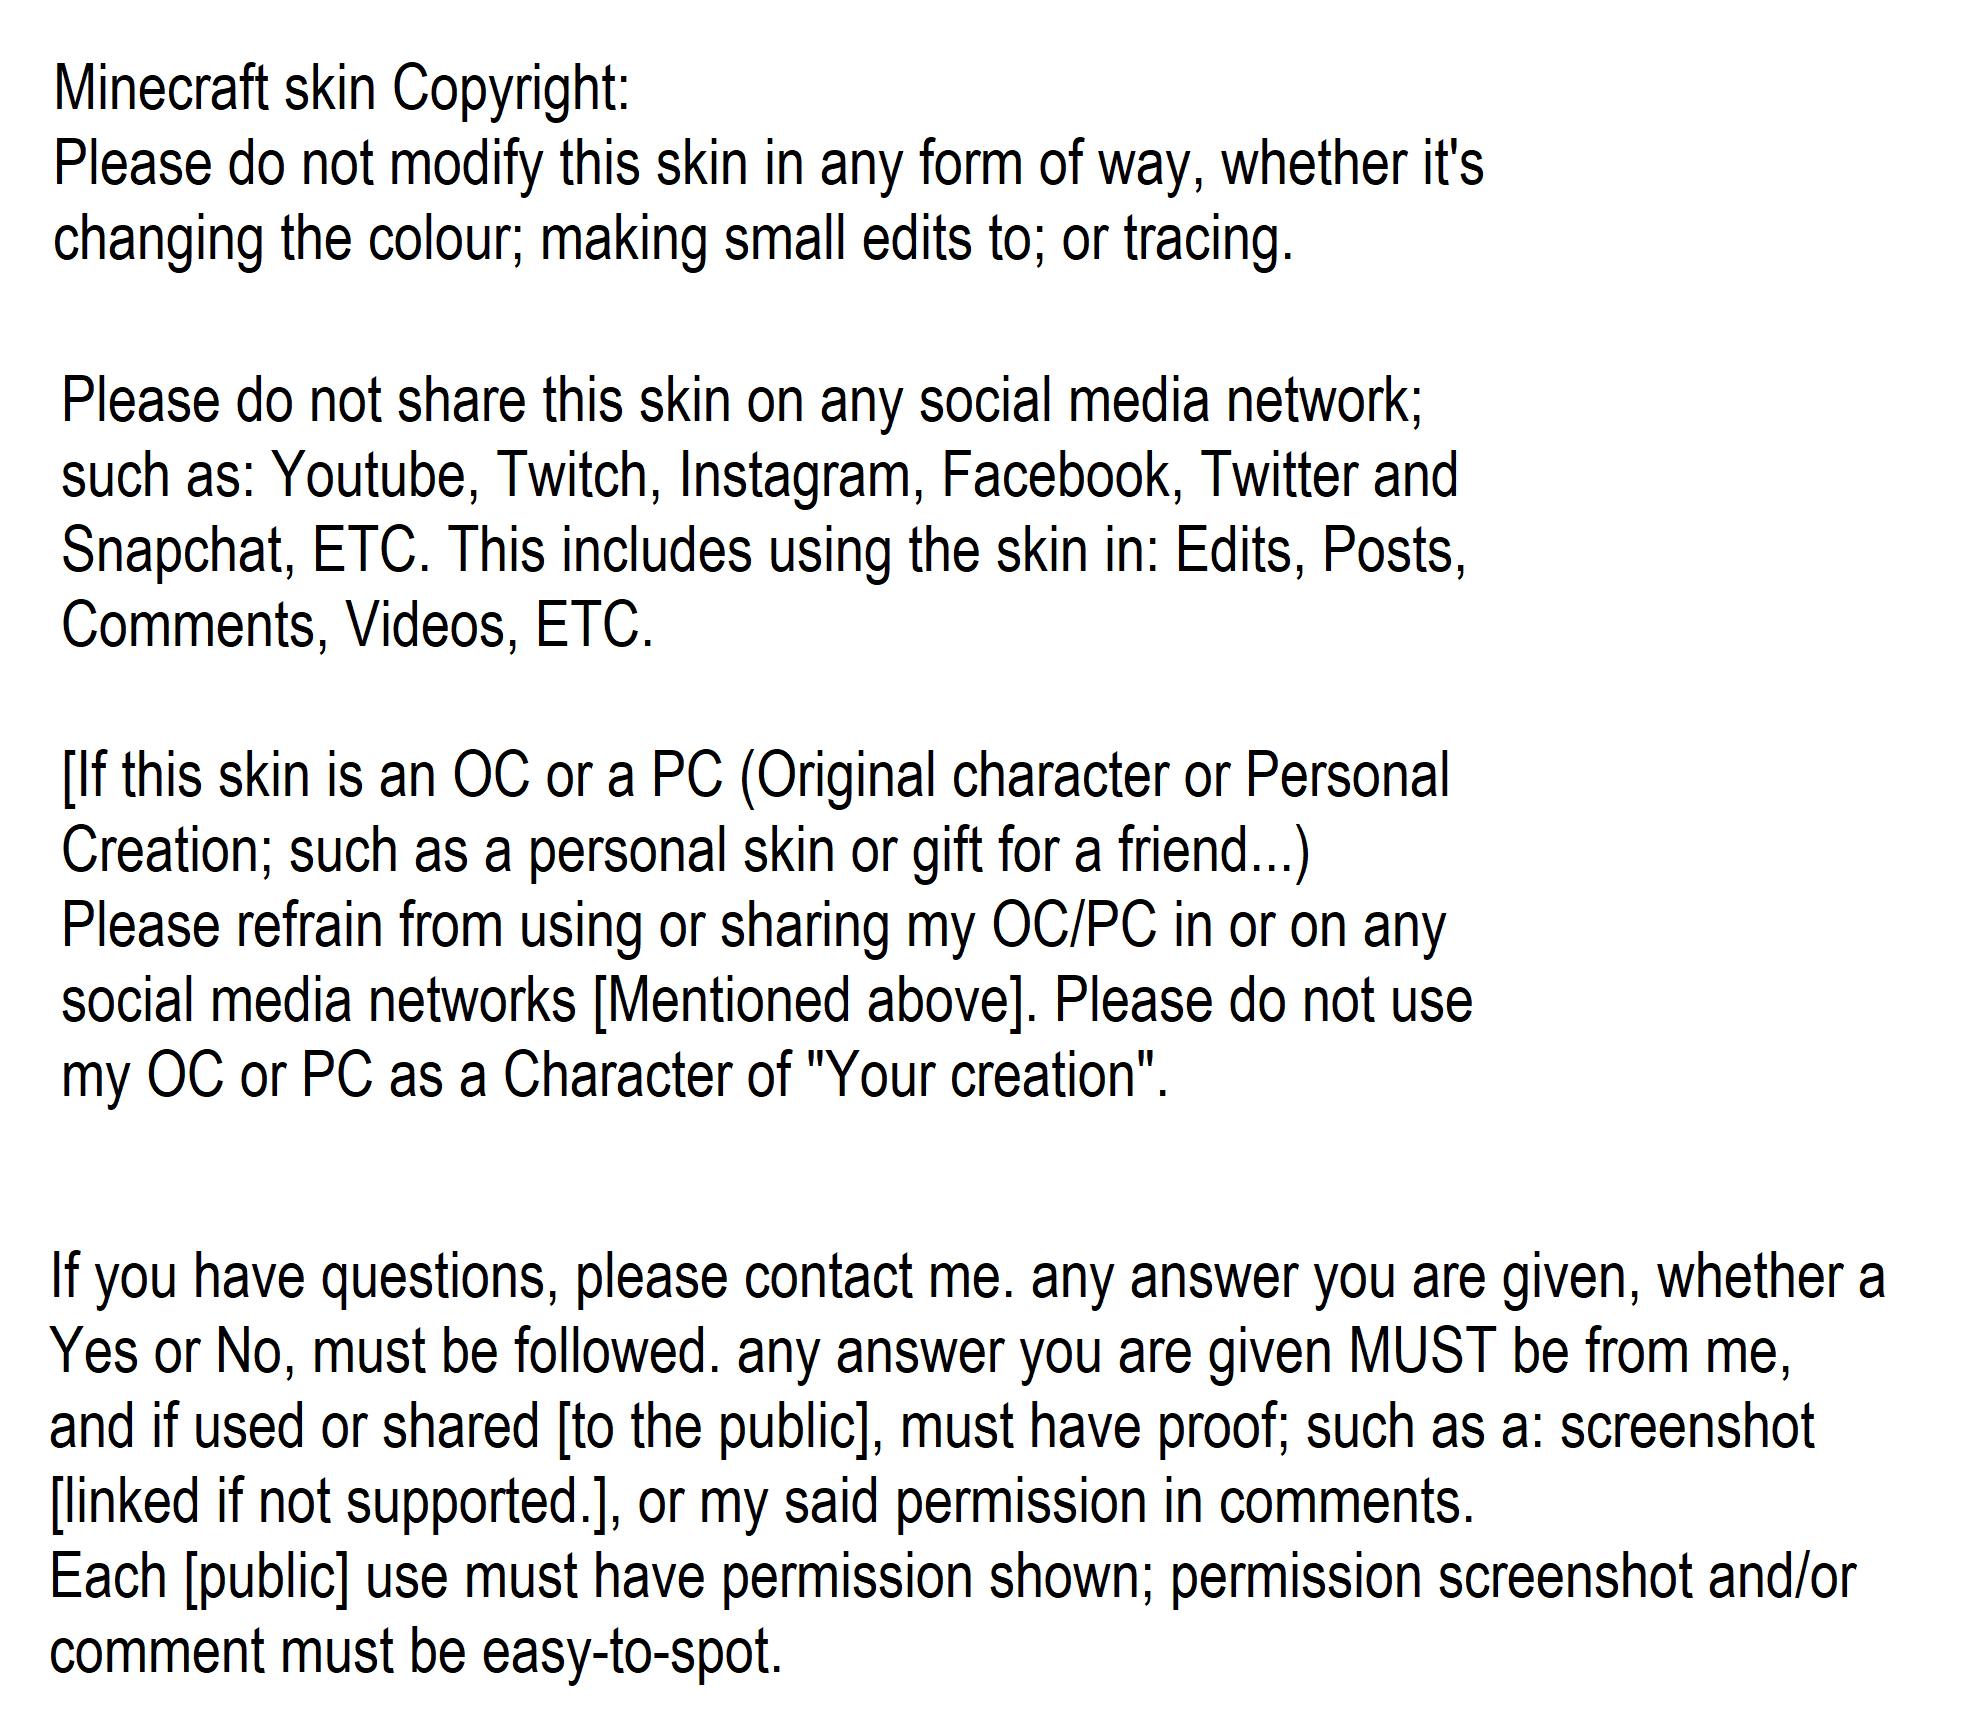 https://cdn.discordapp.com/attachments/588116245950496798/593059988025638913/Minecraft_skin_Copyright_1.png